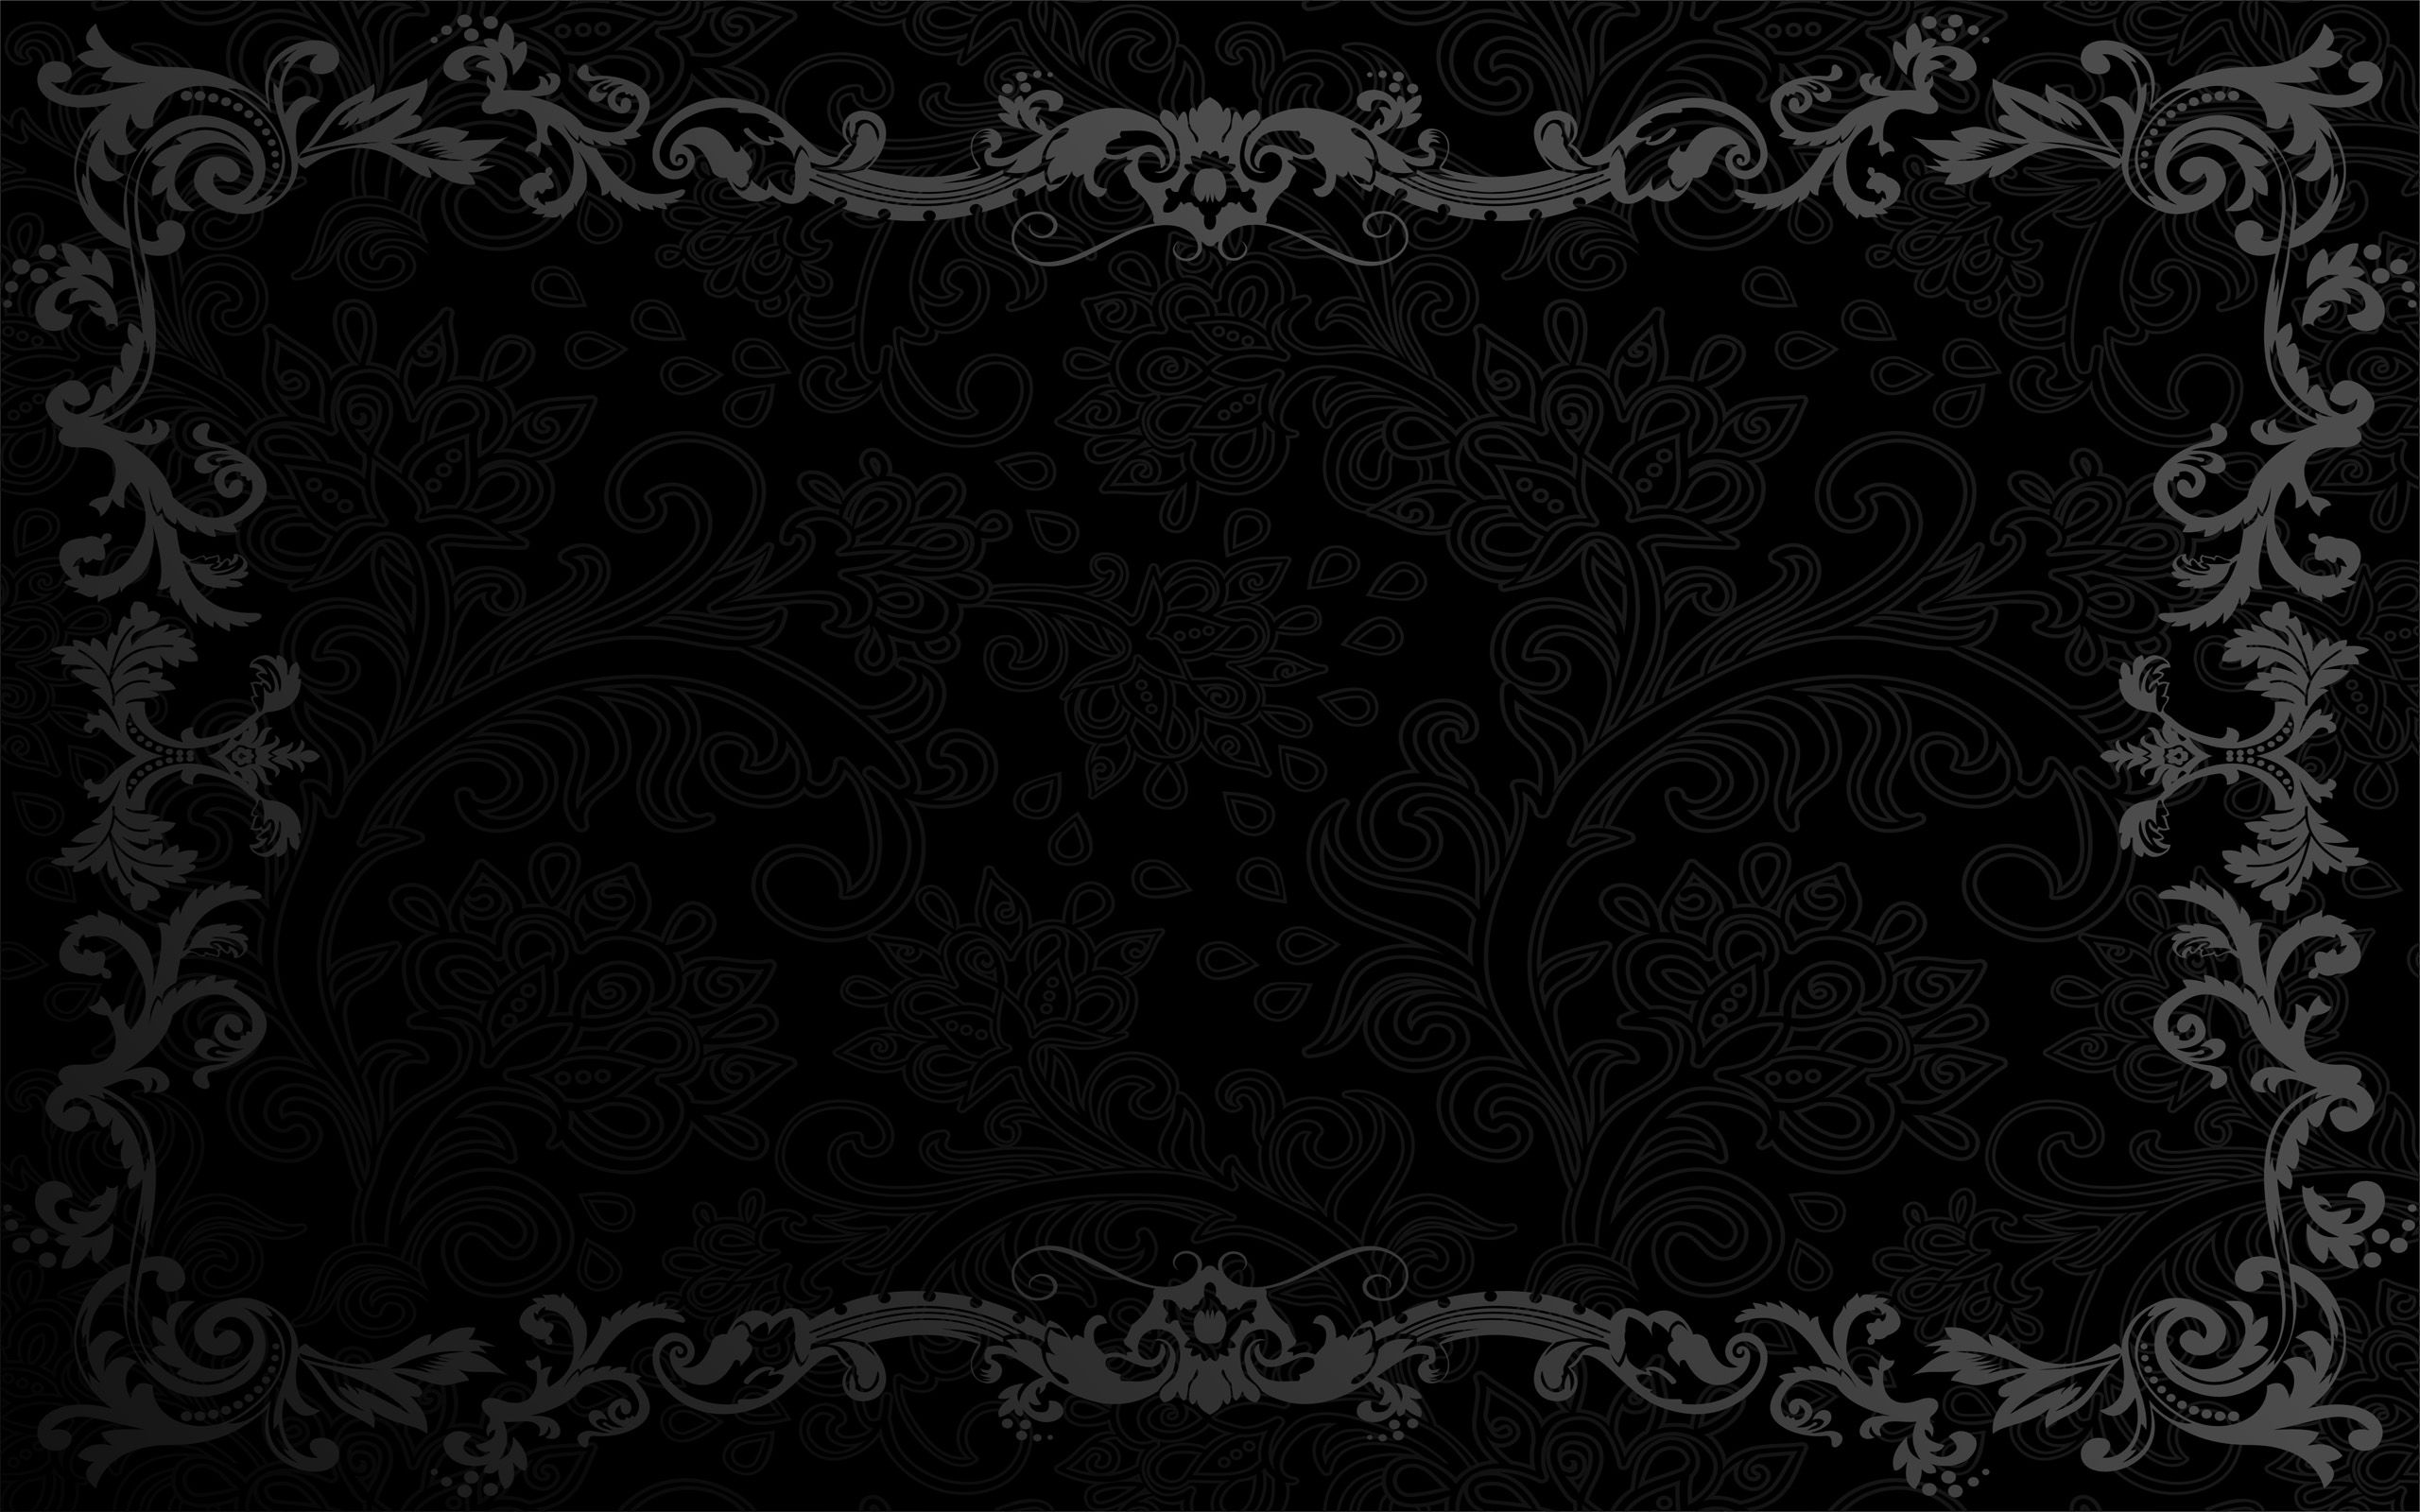 Background In Black Found On Google Black Hd Wallpaper Black Background Wallpaper Black Wallpaper